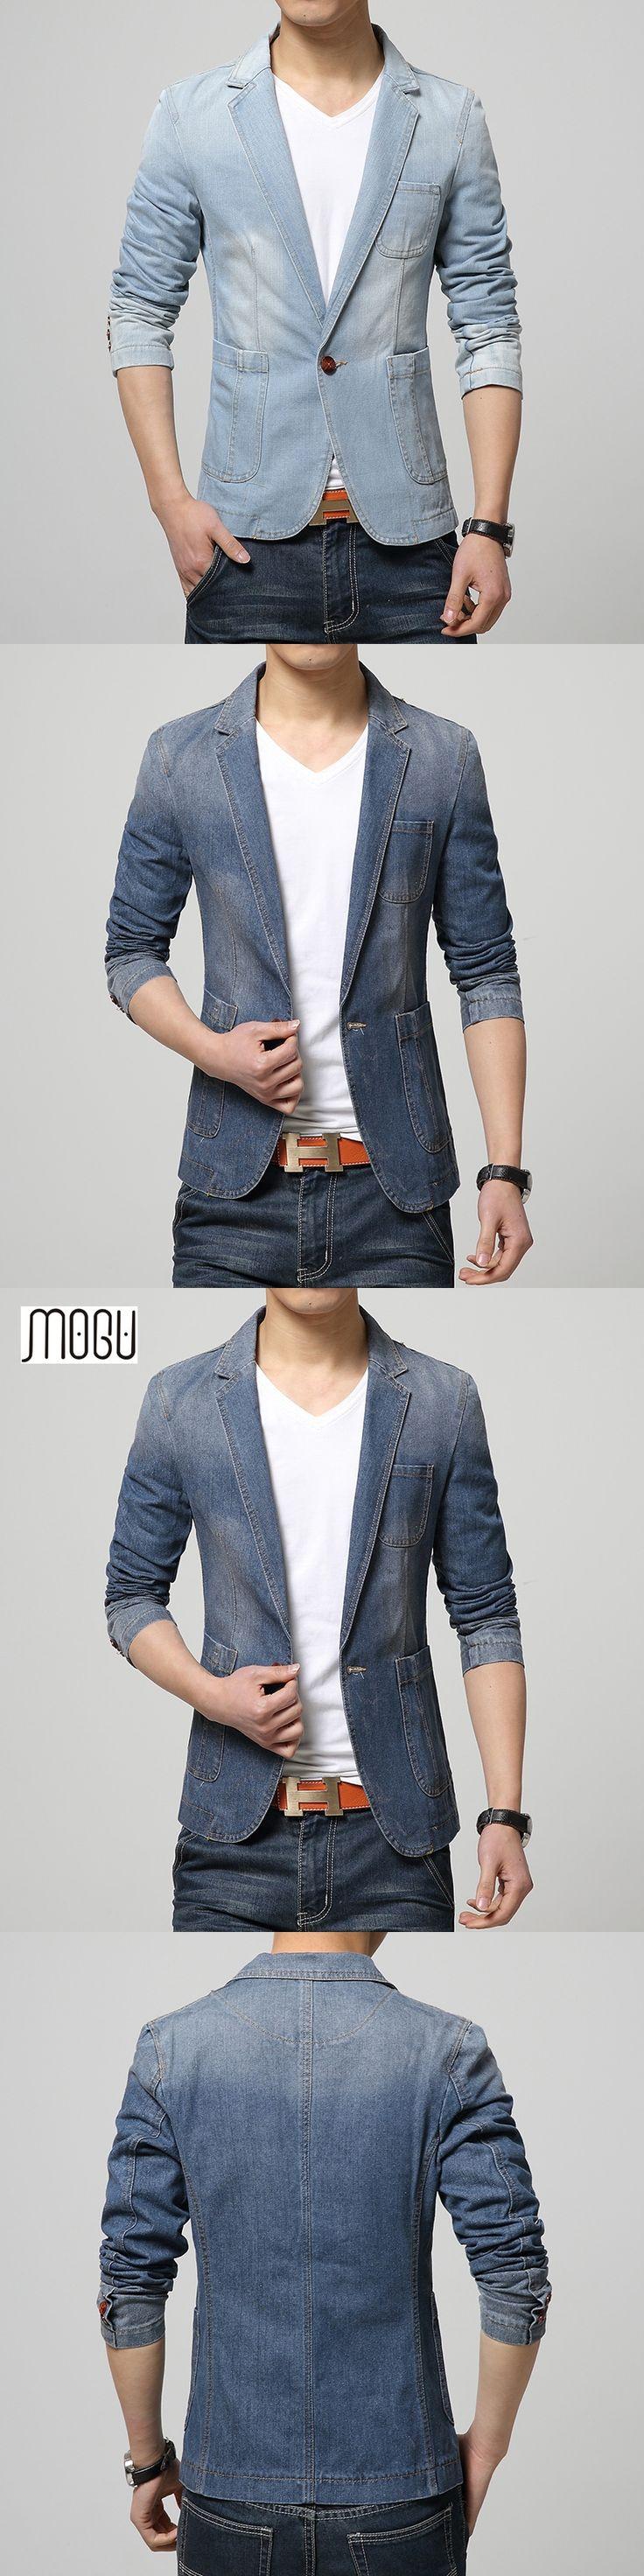 New Arrival Denim Blazer Men Cotton One Button Mens Blazer Jacket Blue Jeans Jacket Men Blazer Slim Fit